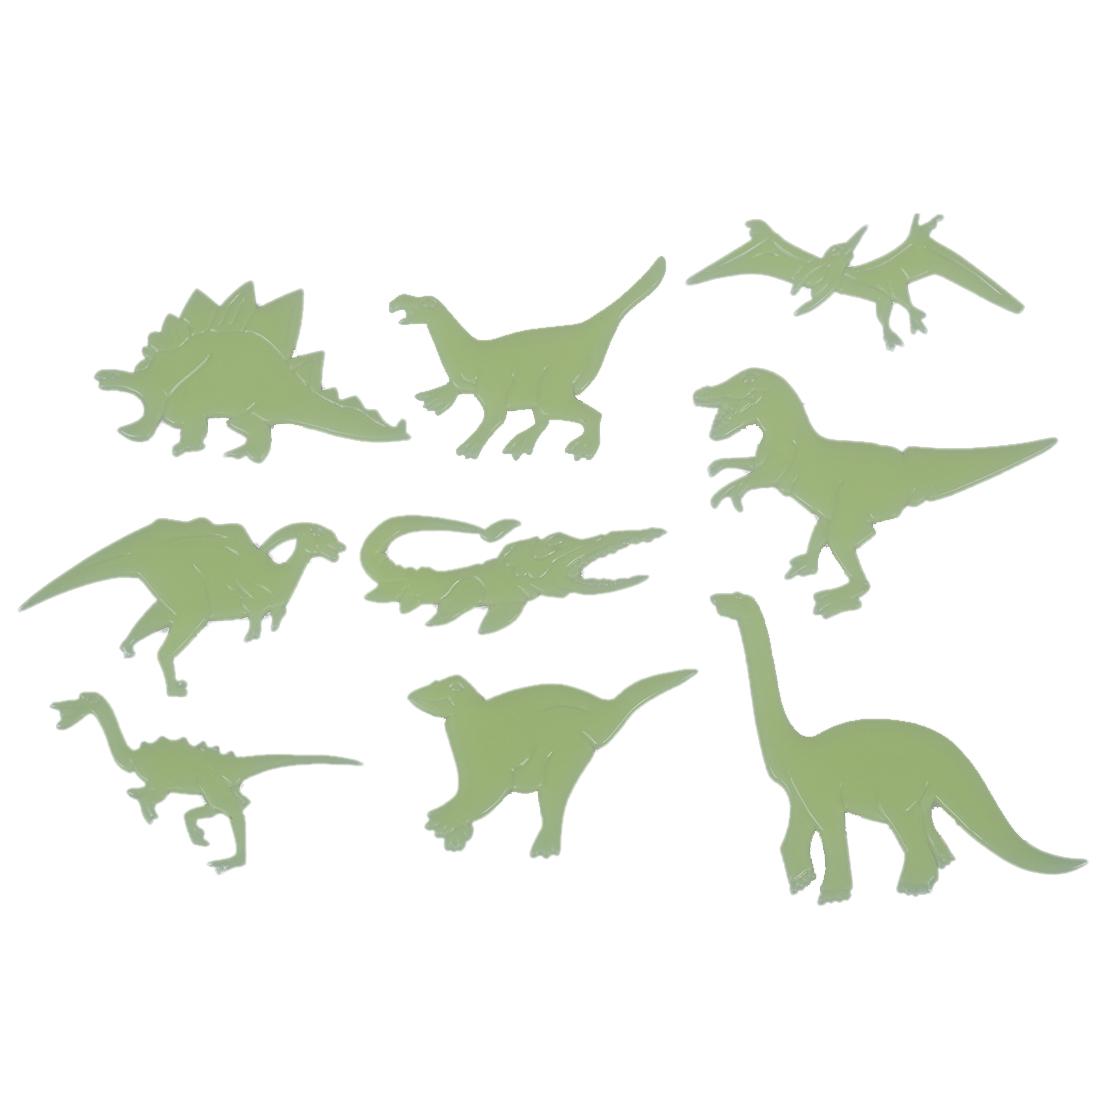 Fun Glow In The Dark Set Of 9 Dinosaurs Plastic Shape Ceilings Walls